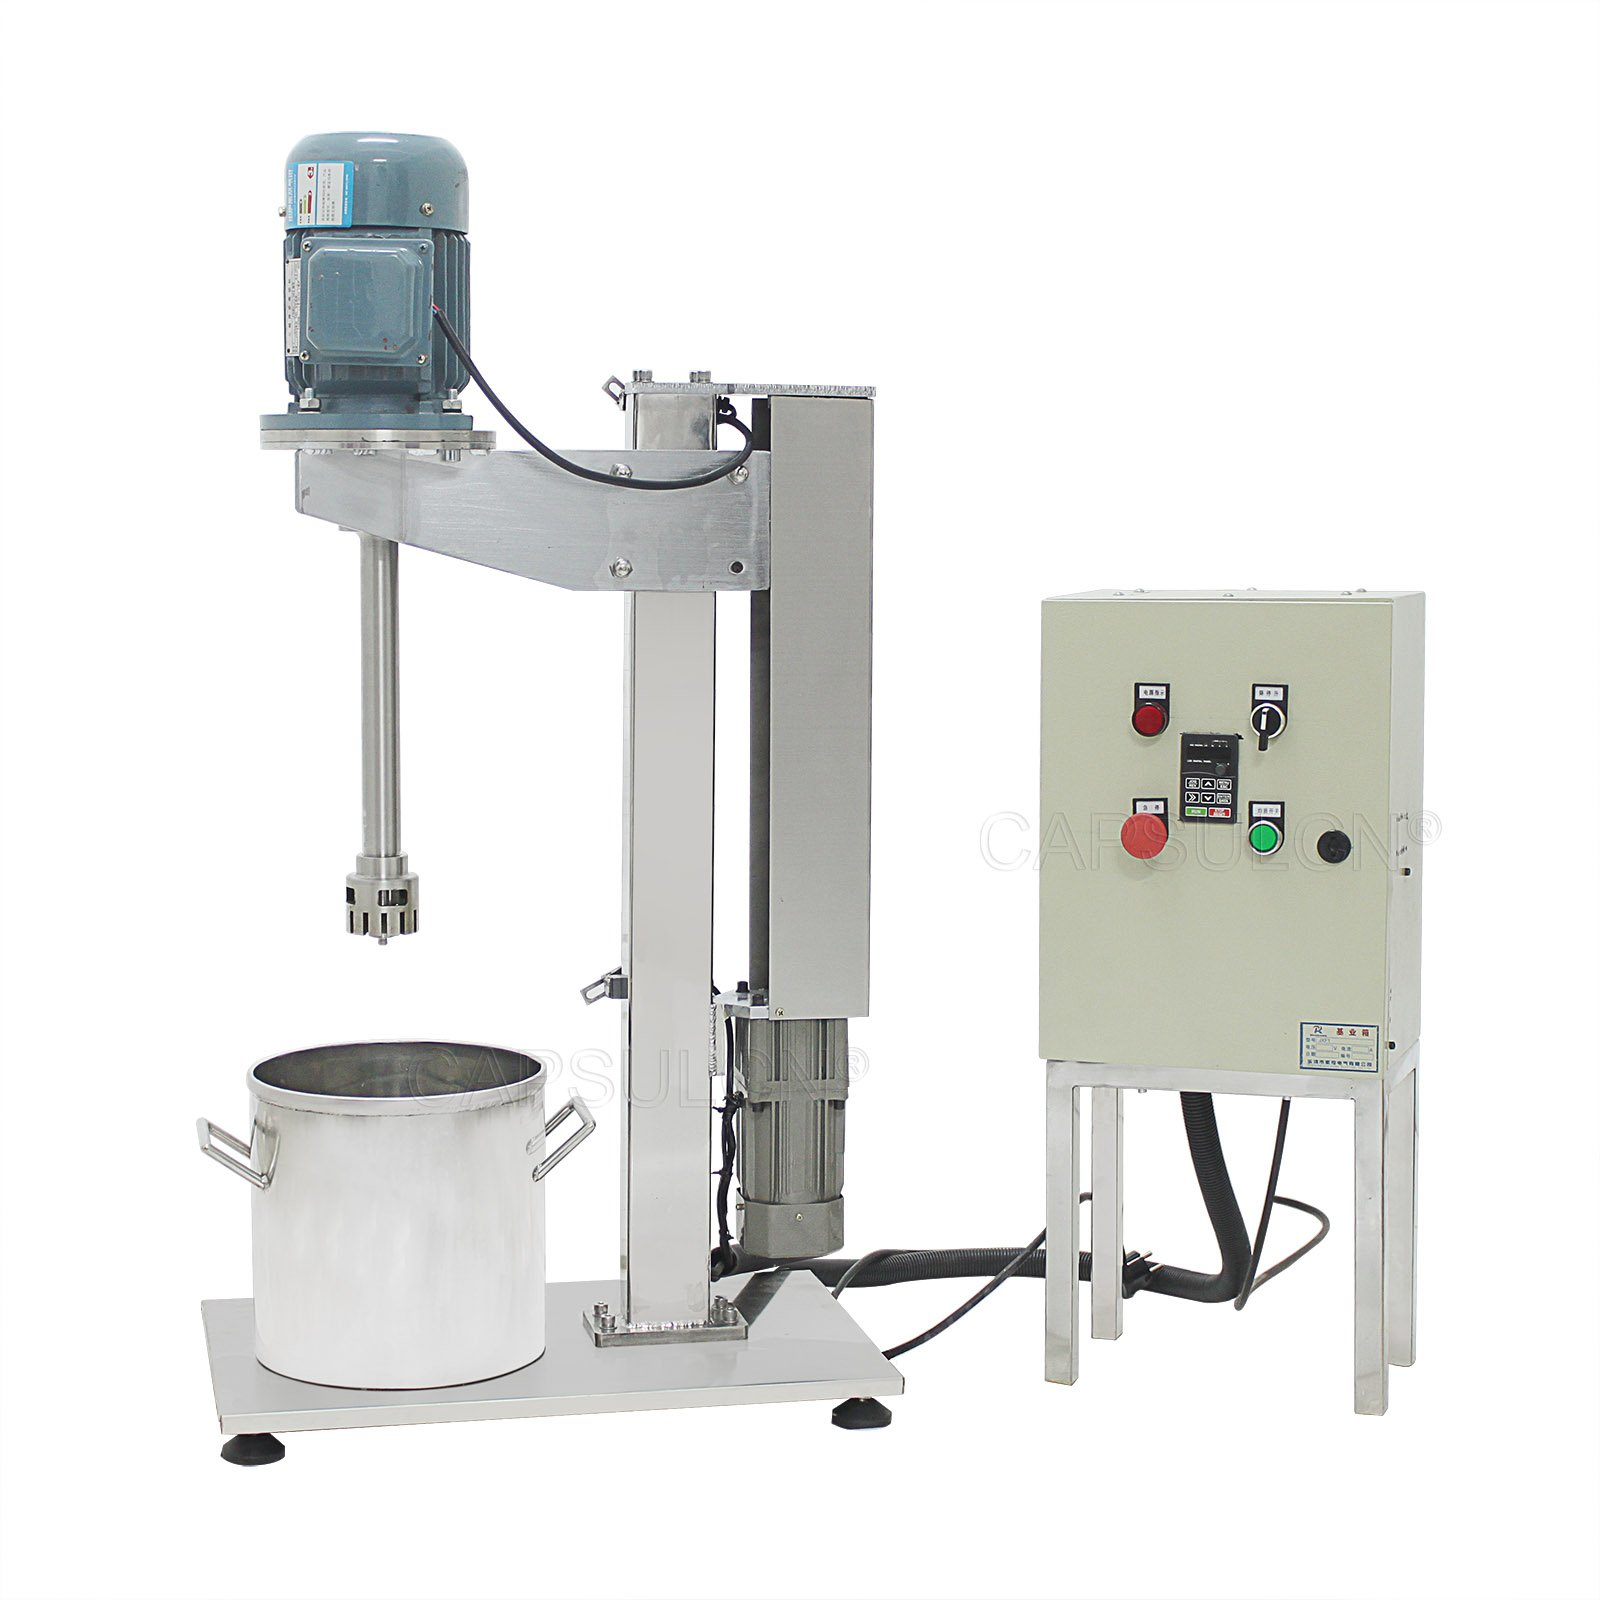 CapsulCN® W-100 High Shear Mixer Machine, 0.55KW for Mixer Disperser Emulsifying Machine,Emulsion Machine (220V/50HZ)